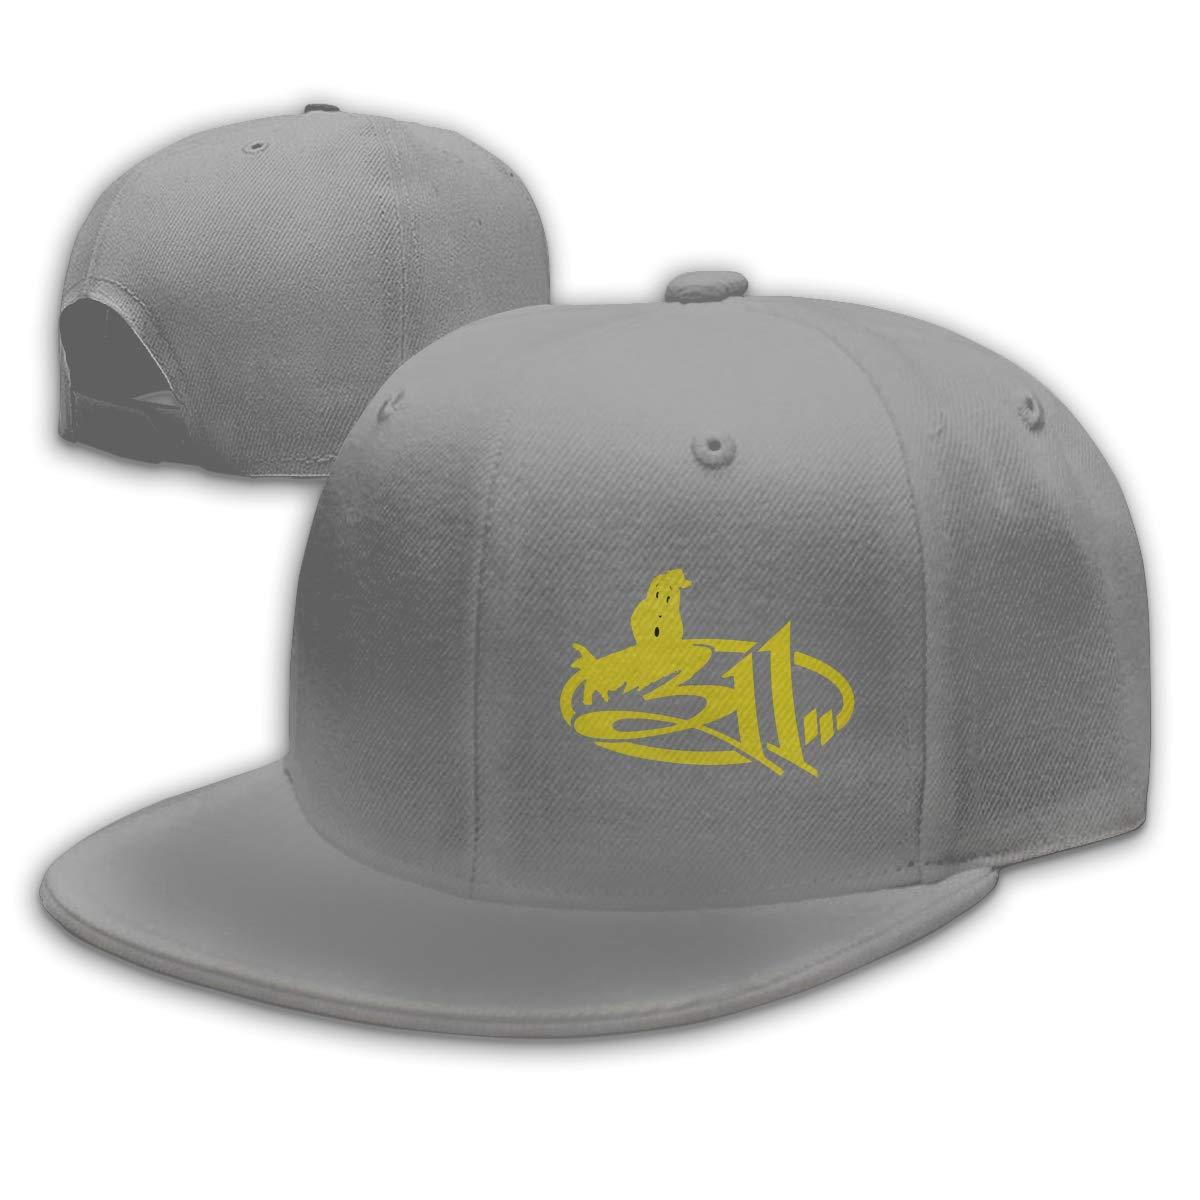 Hjonn/&vnxxog 311 Rock for Men Hats